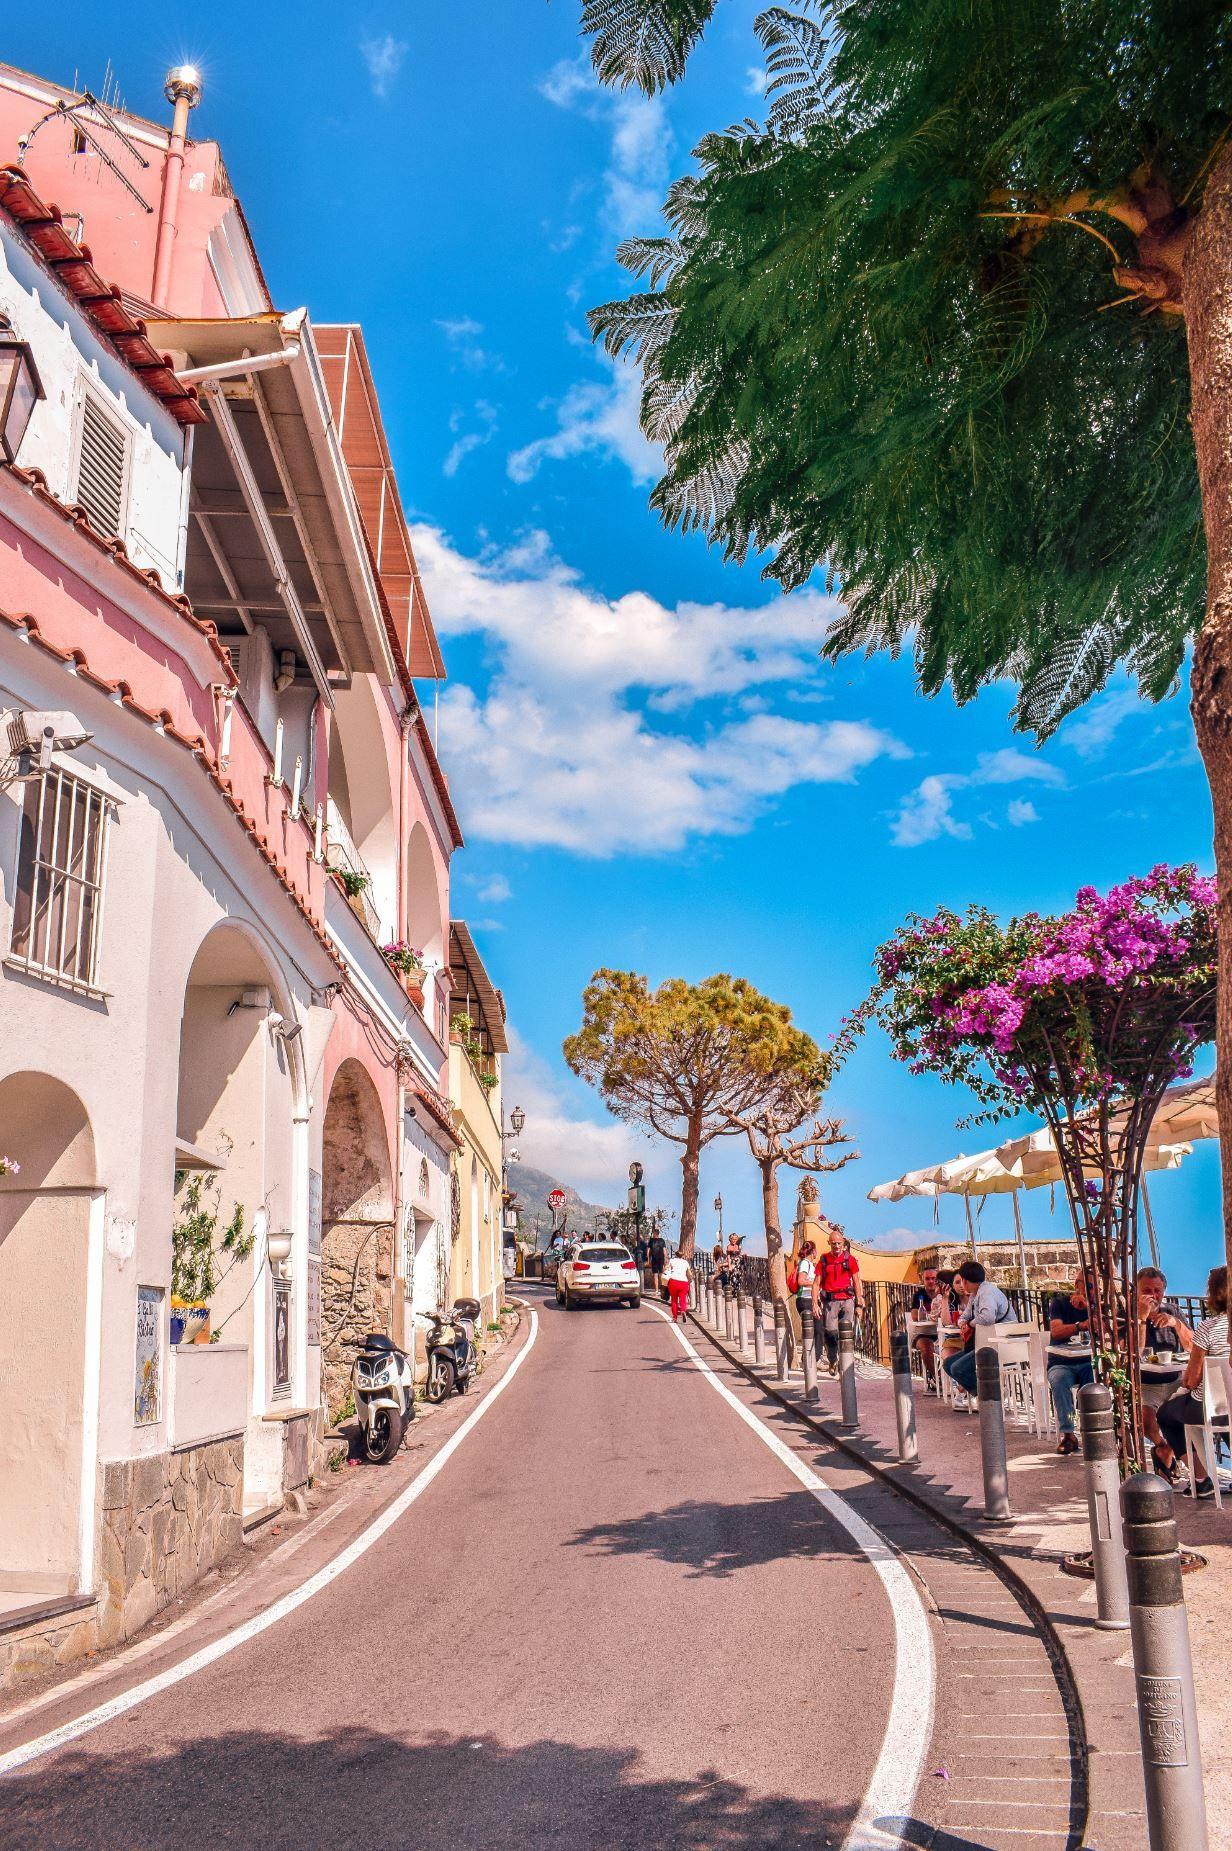 The most beautiful places on the Amalfi Coast